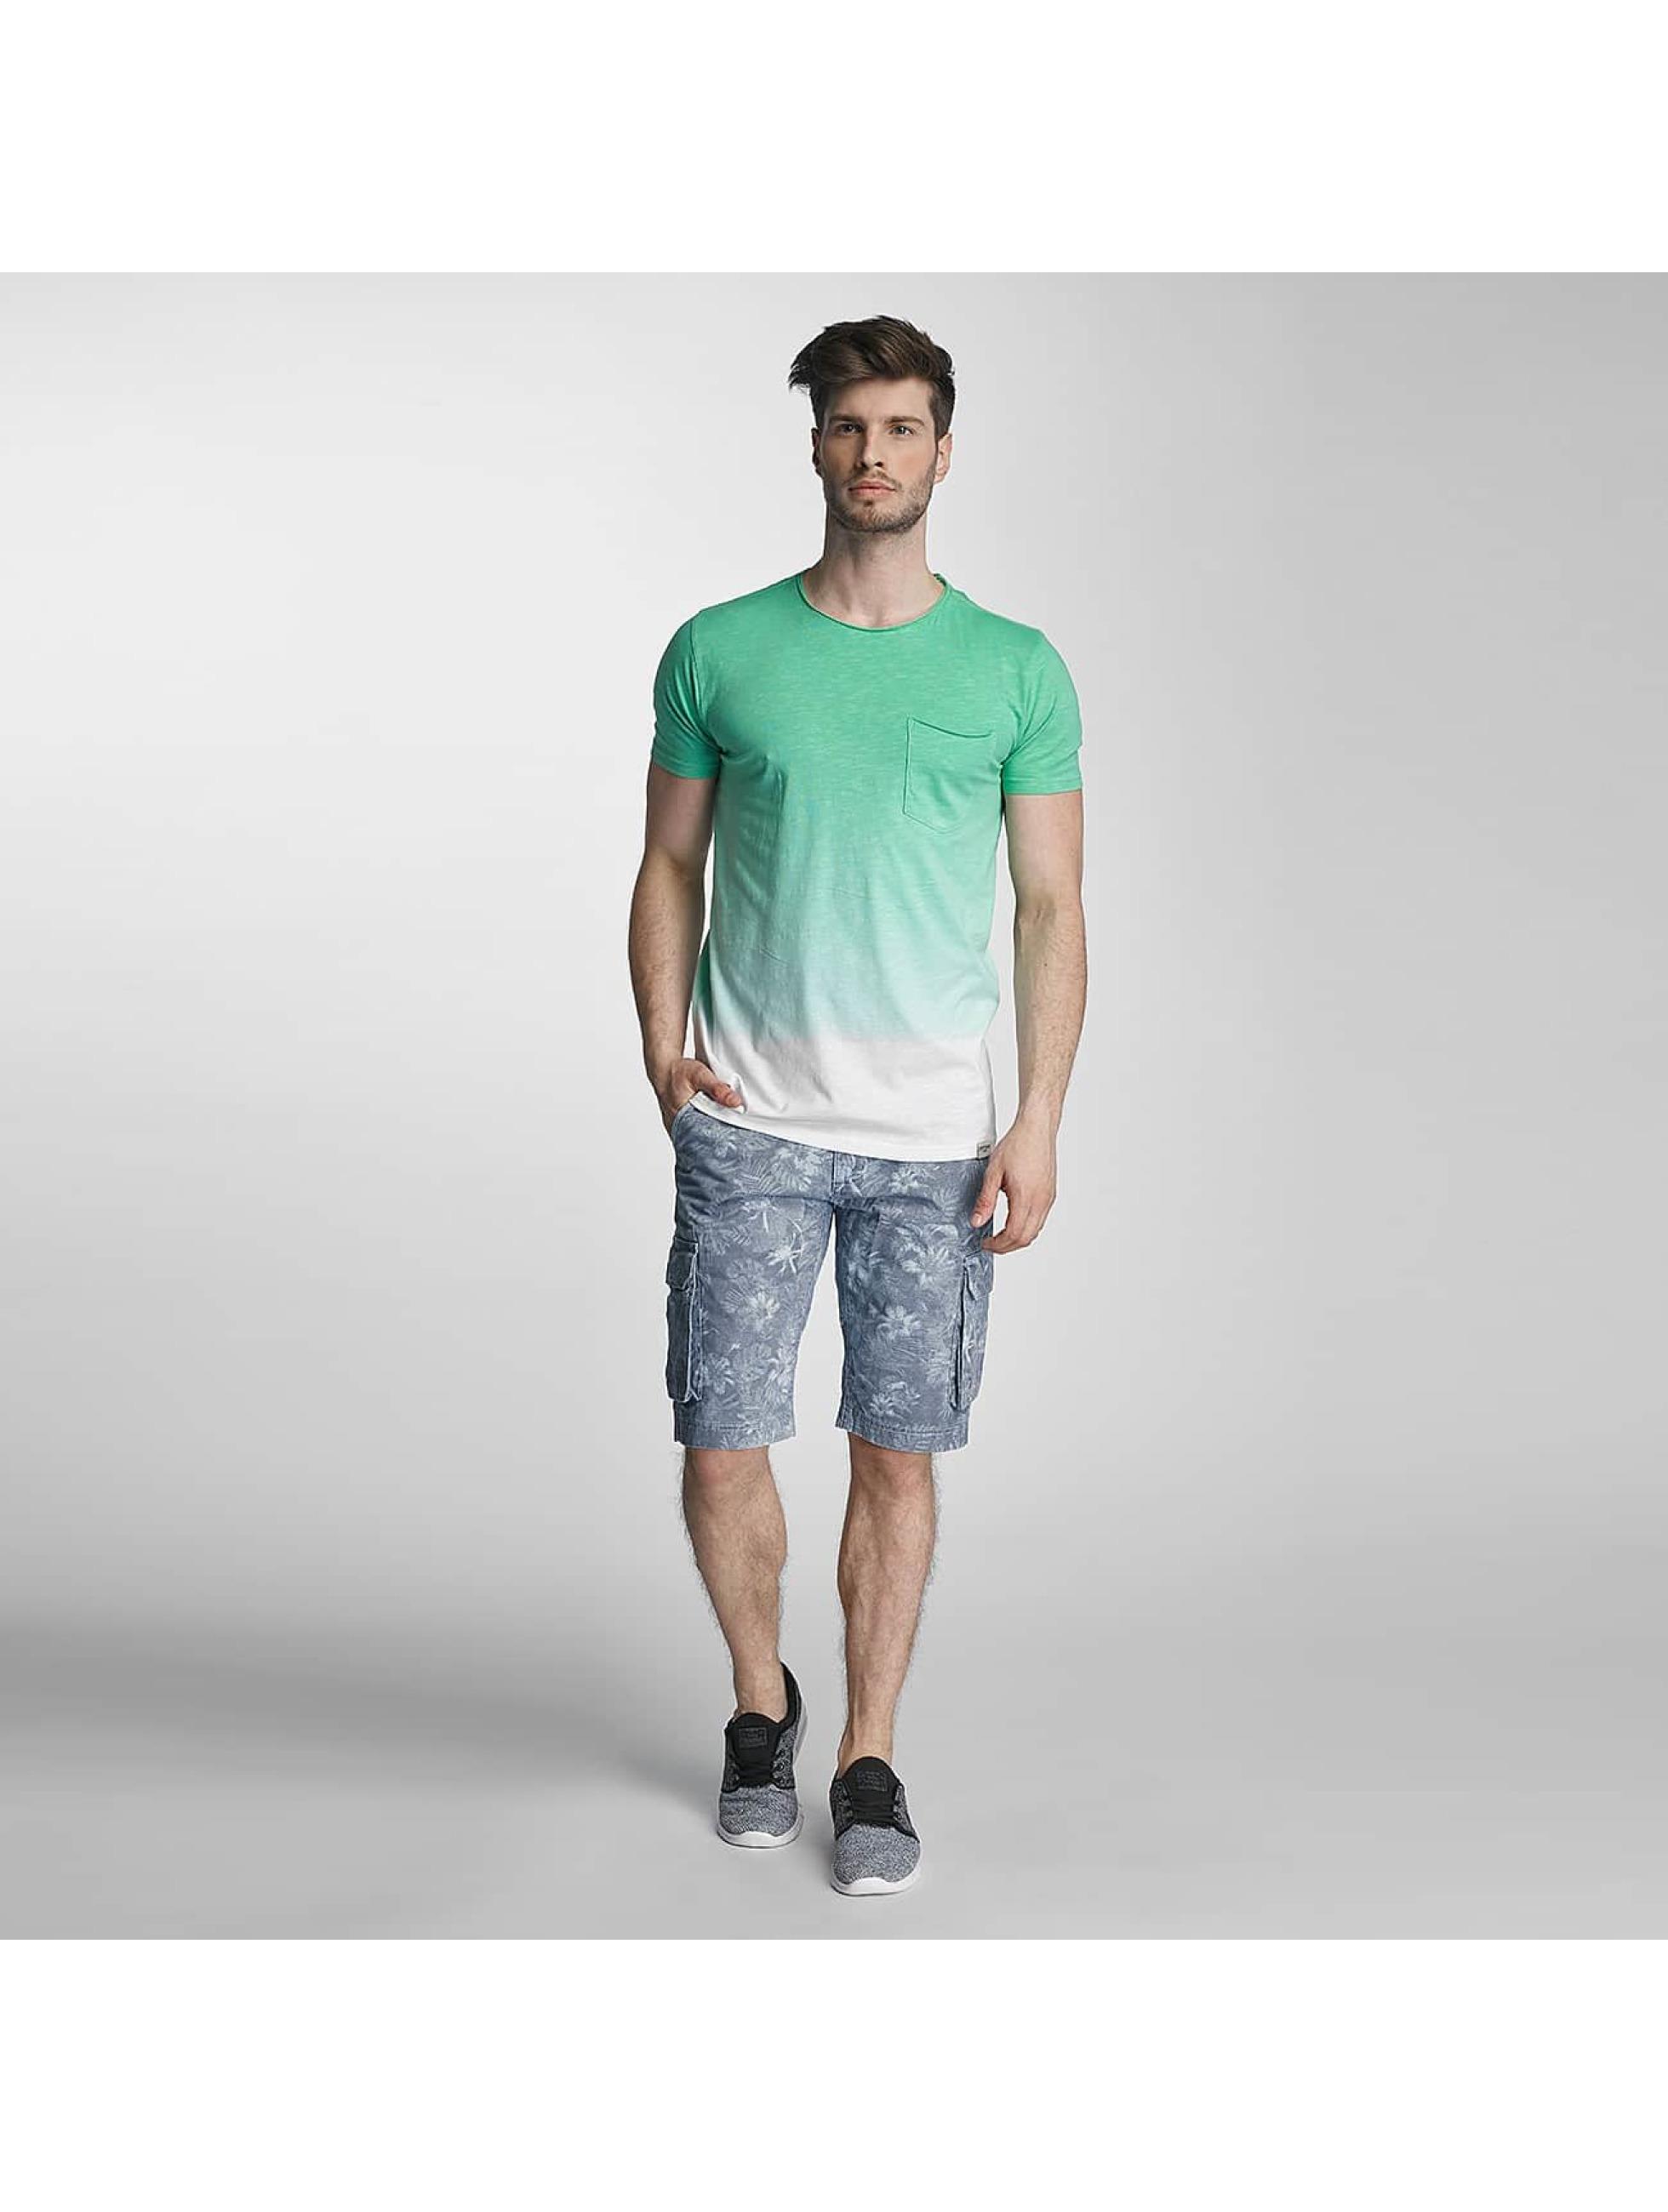 SHINE Original T-Shirt Dip Dyed vert